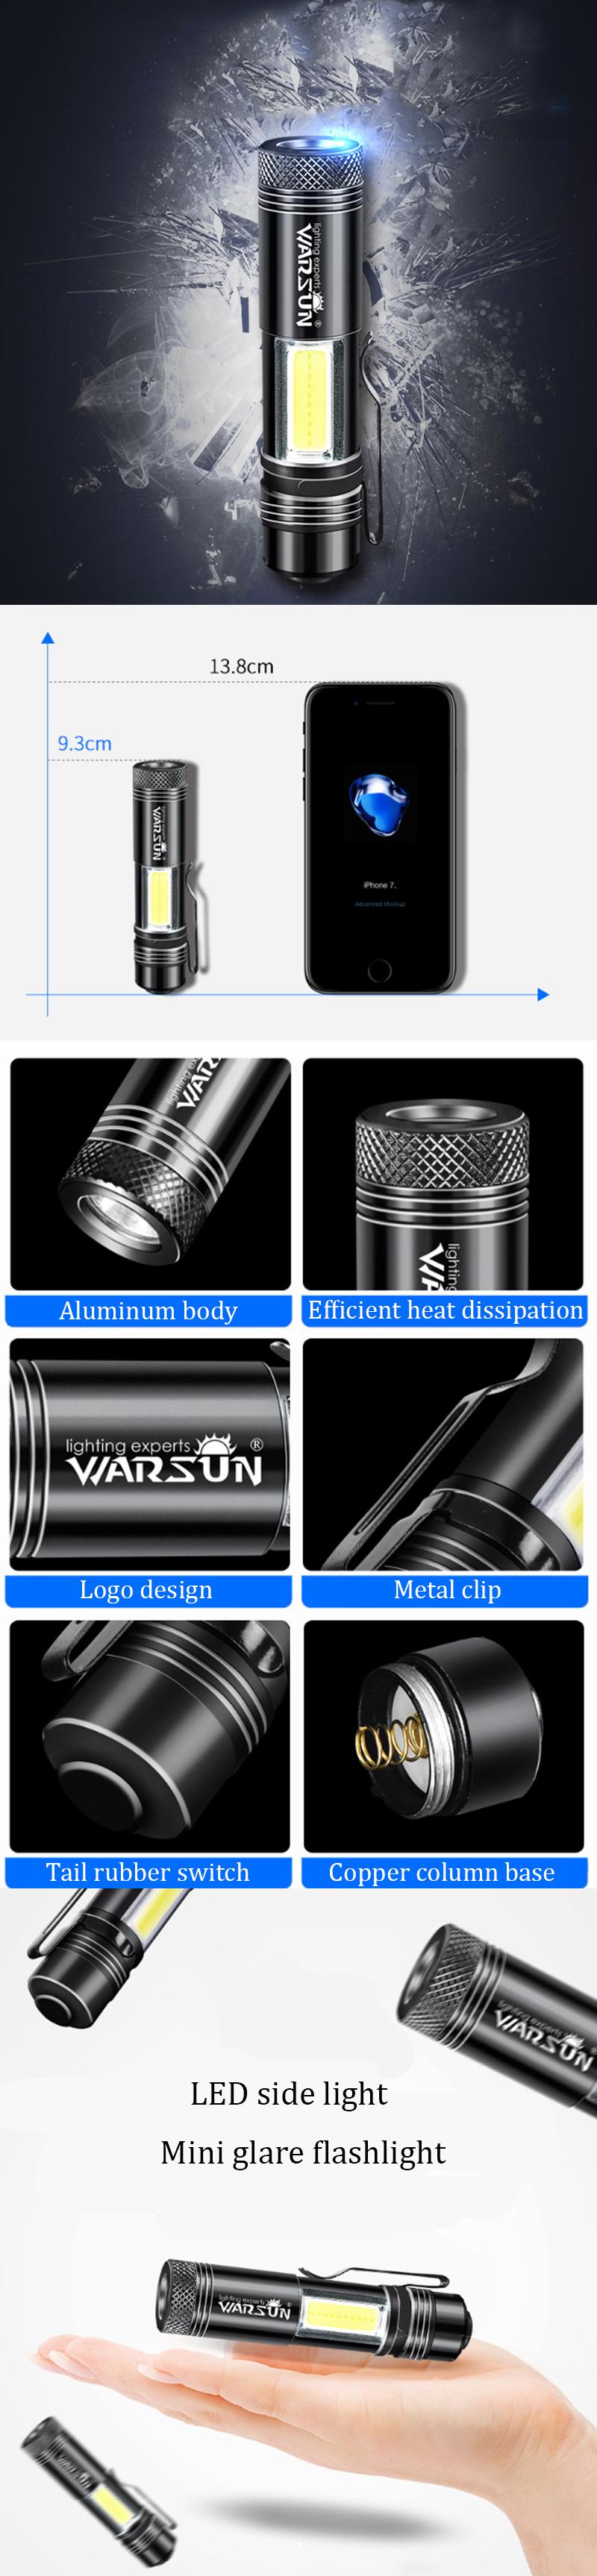 warsun zoom 8 14500 aa edc flashlight mini led torch ipx6 every day carry keychain light